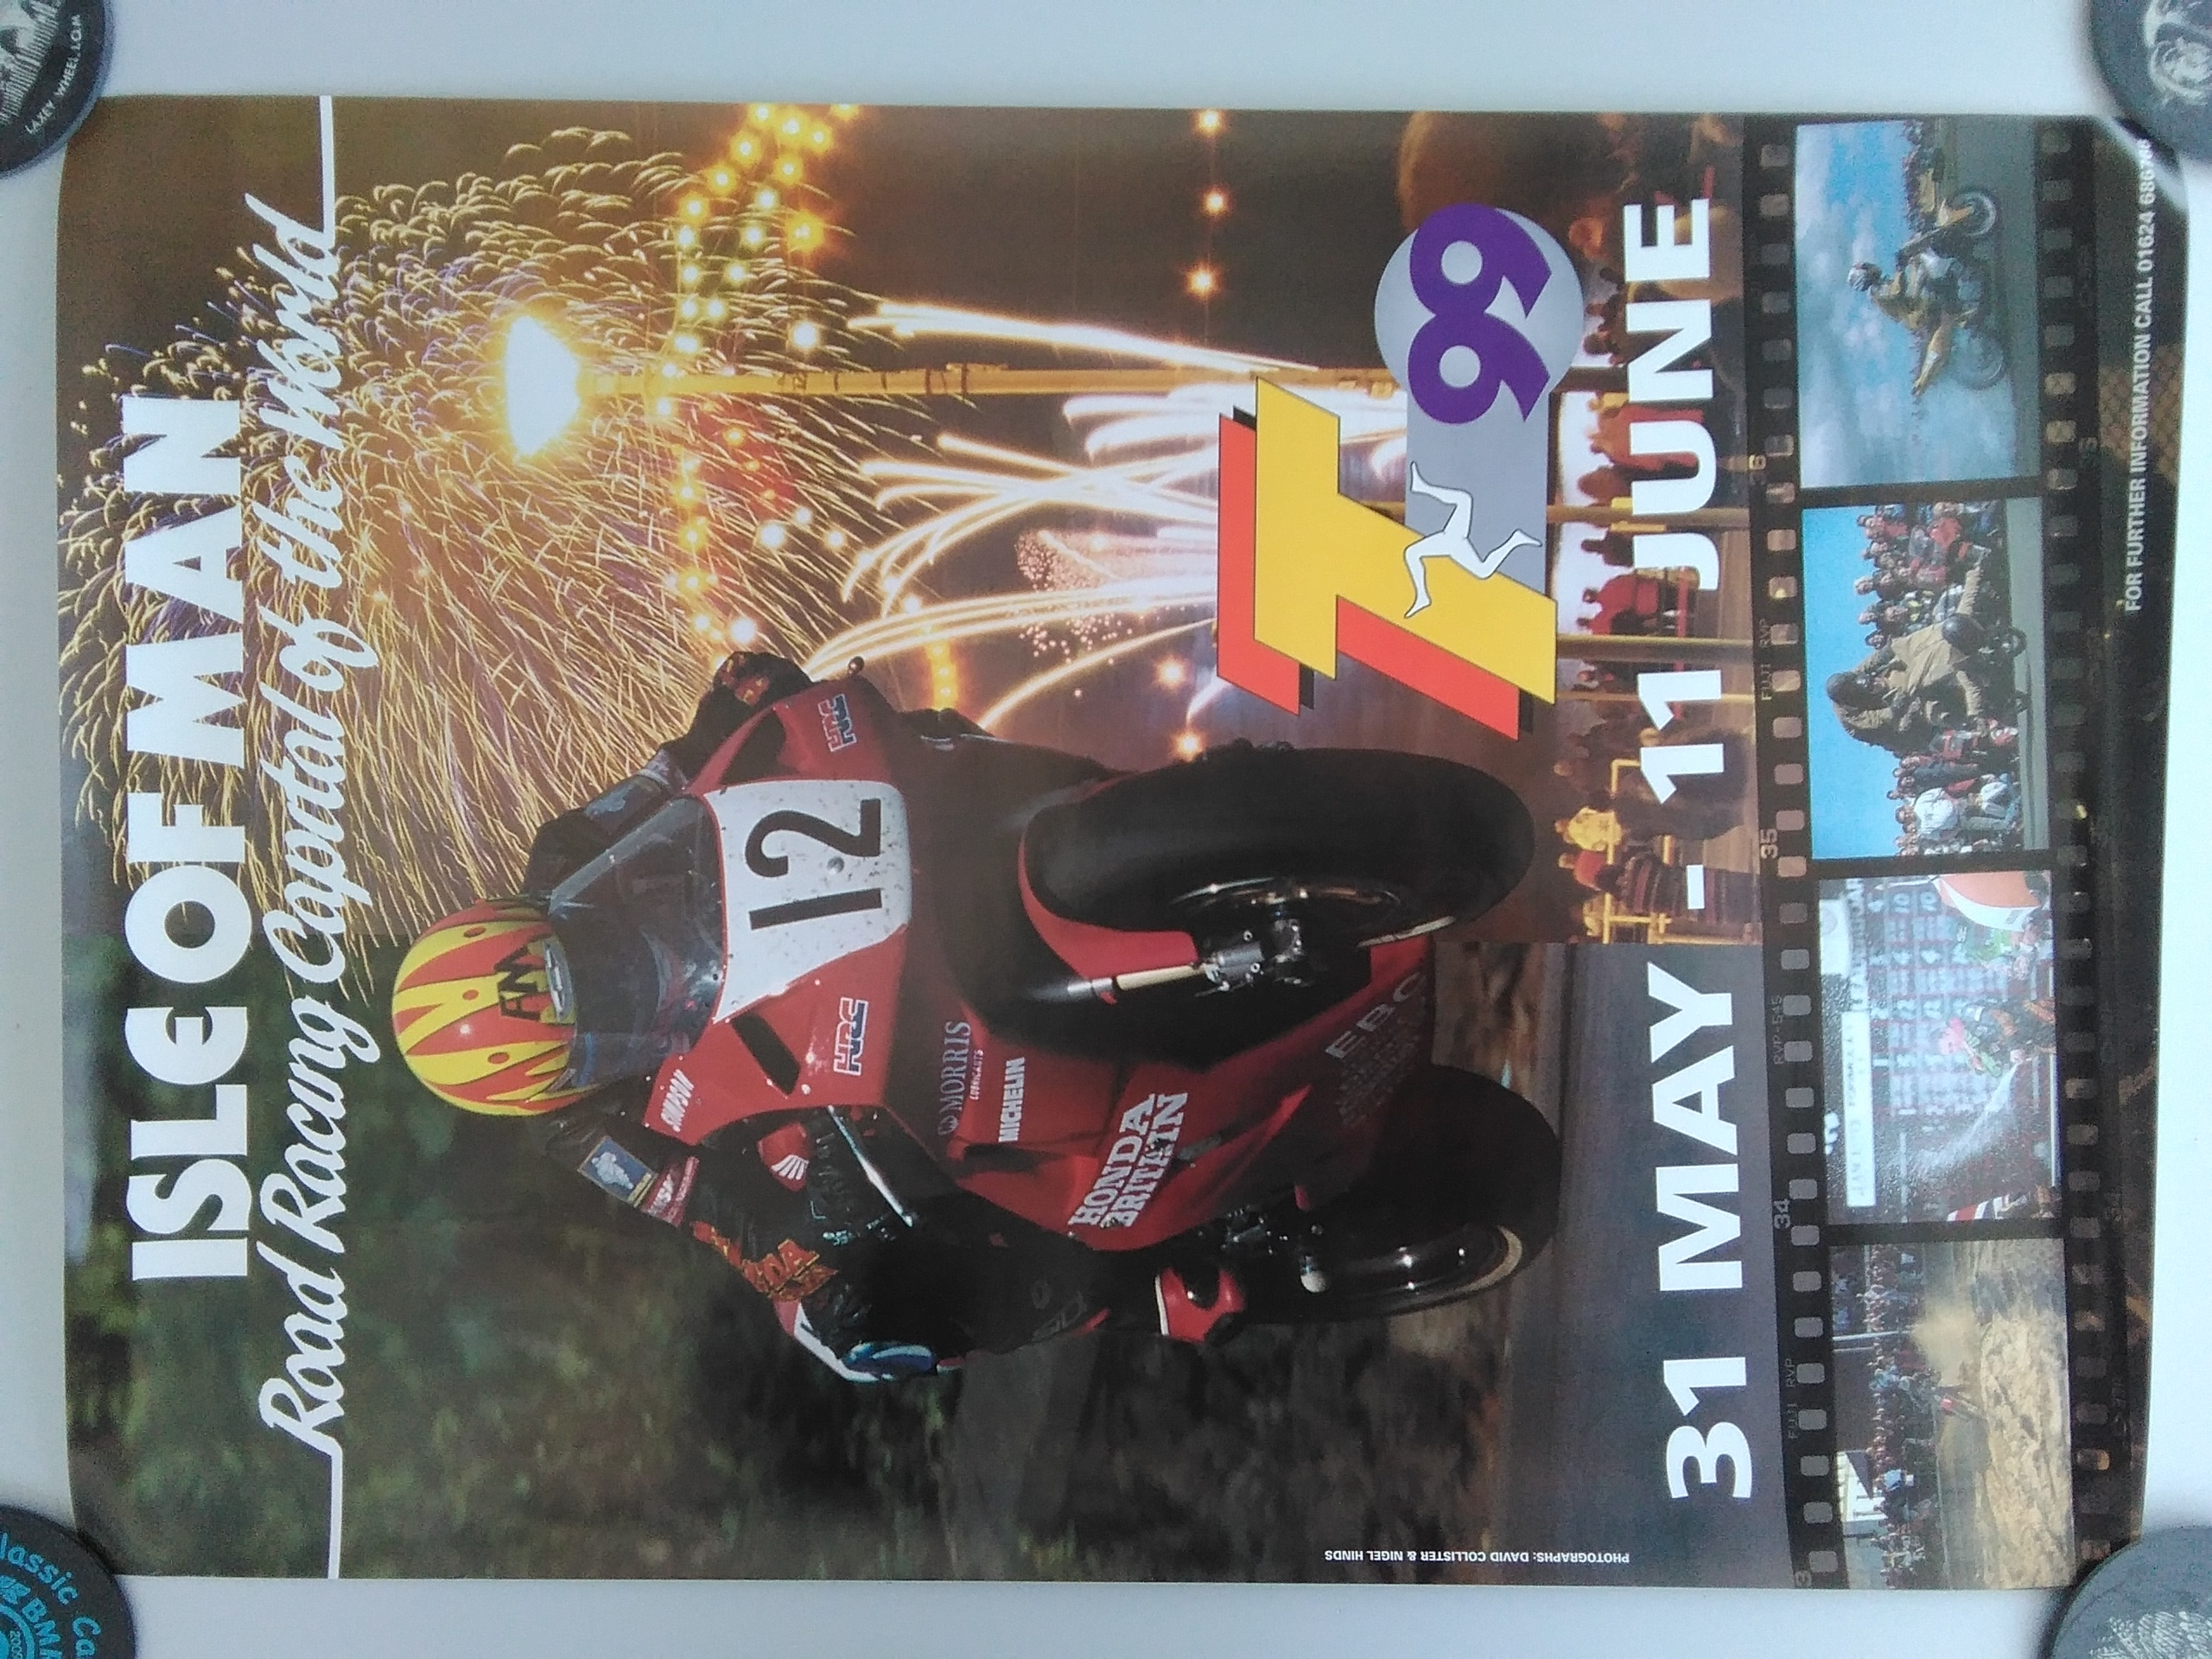 Original 1999 TT Poster